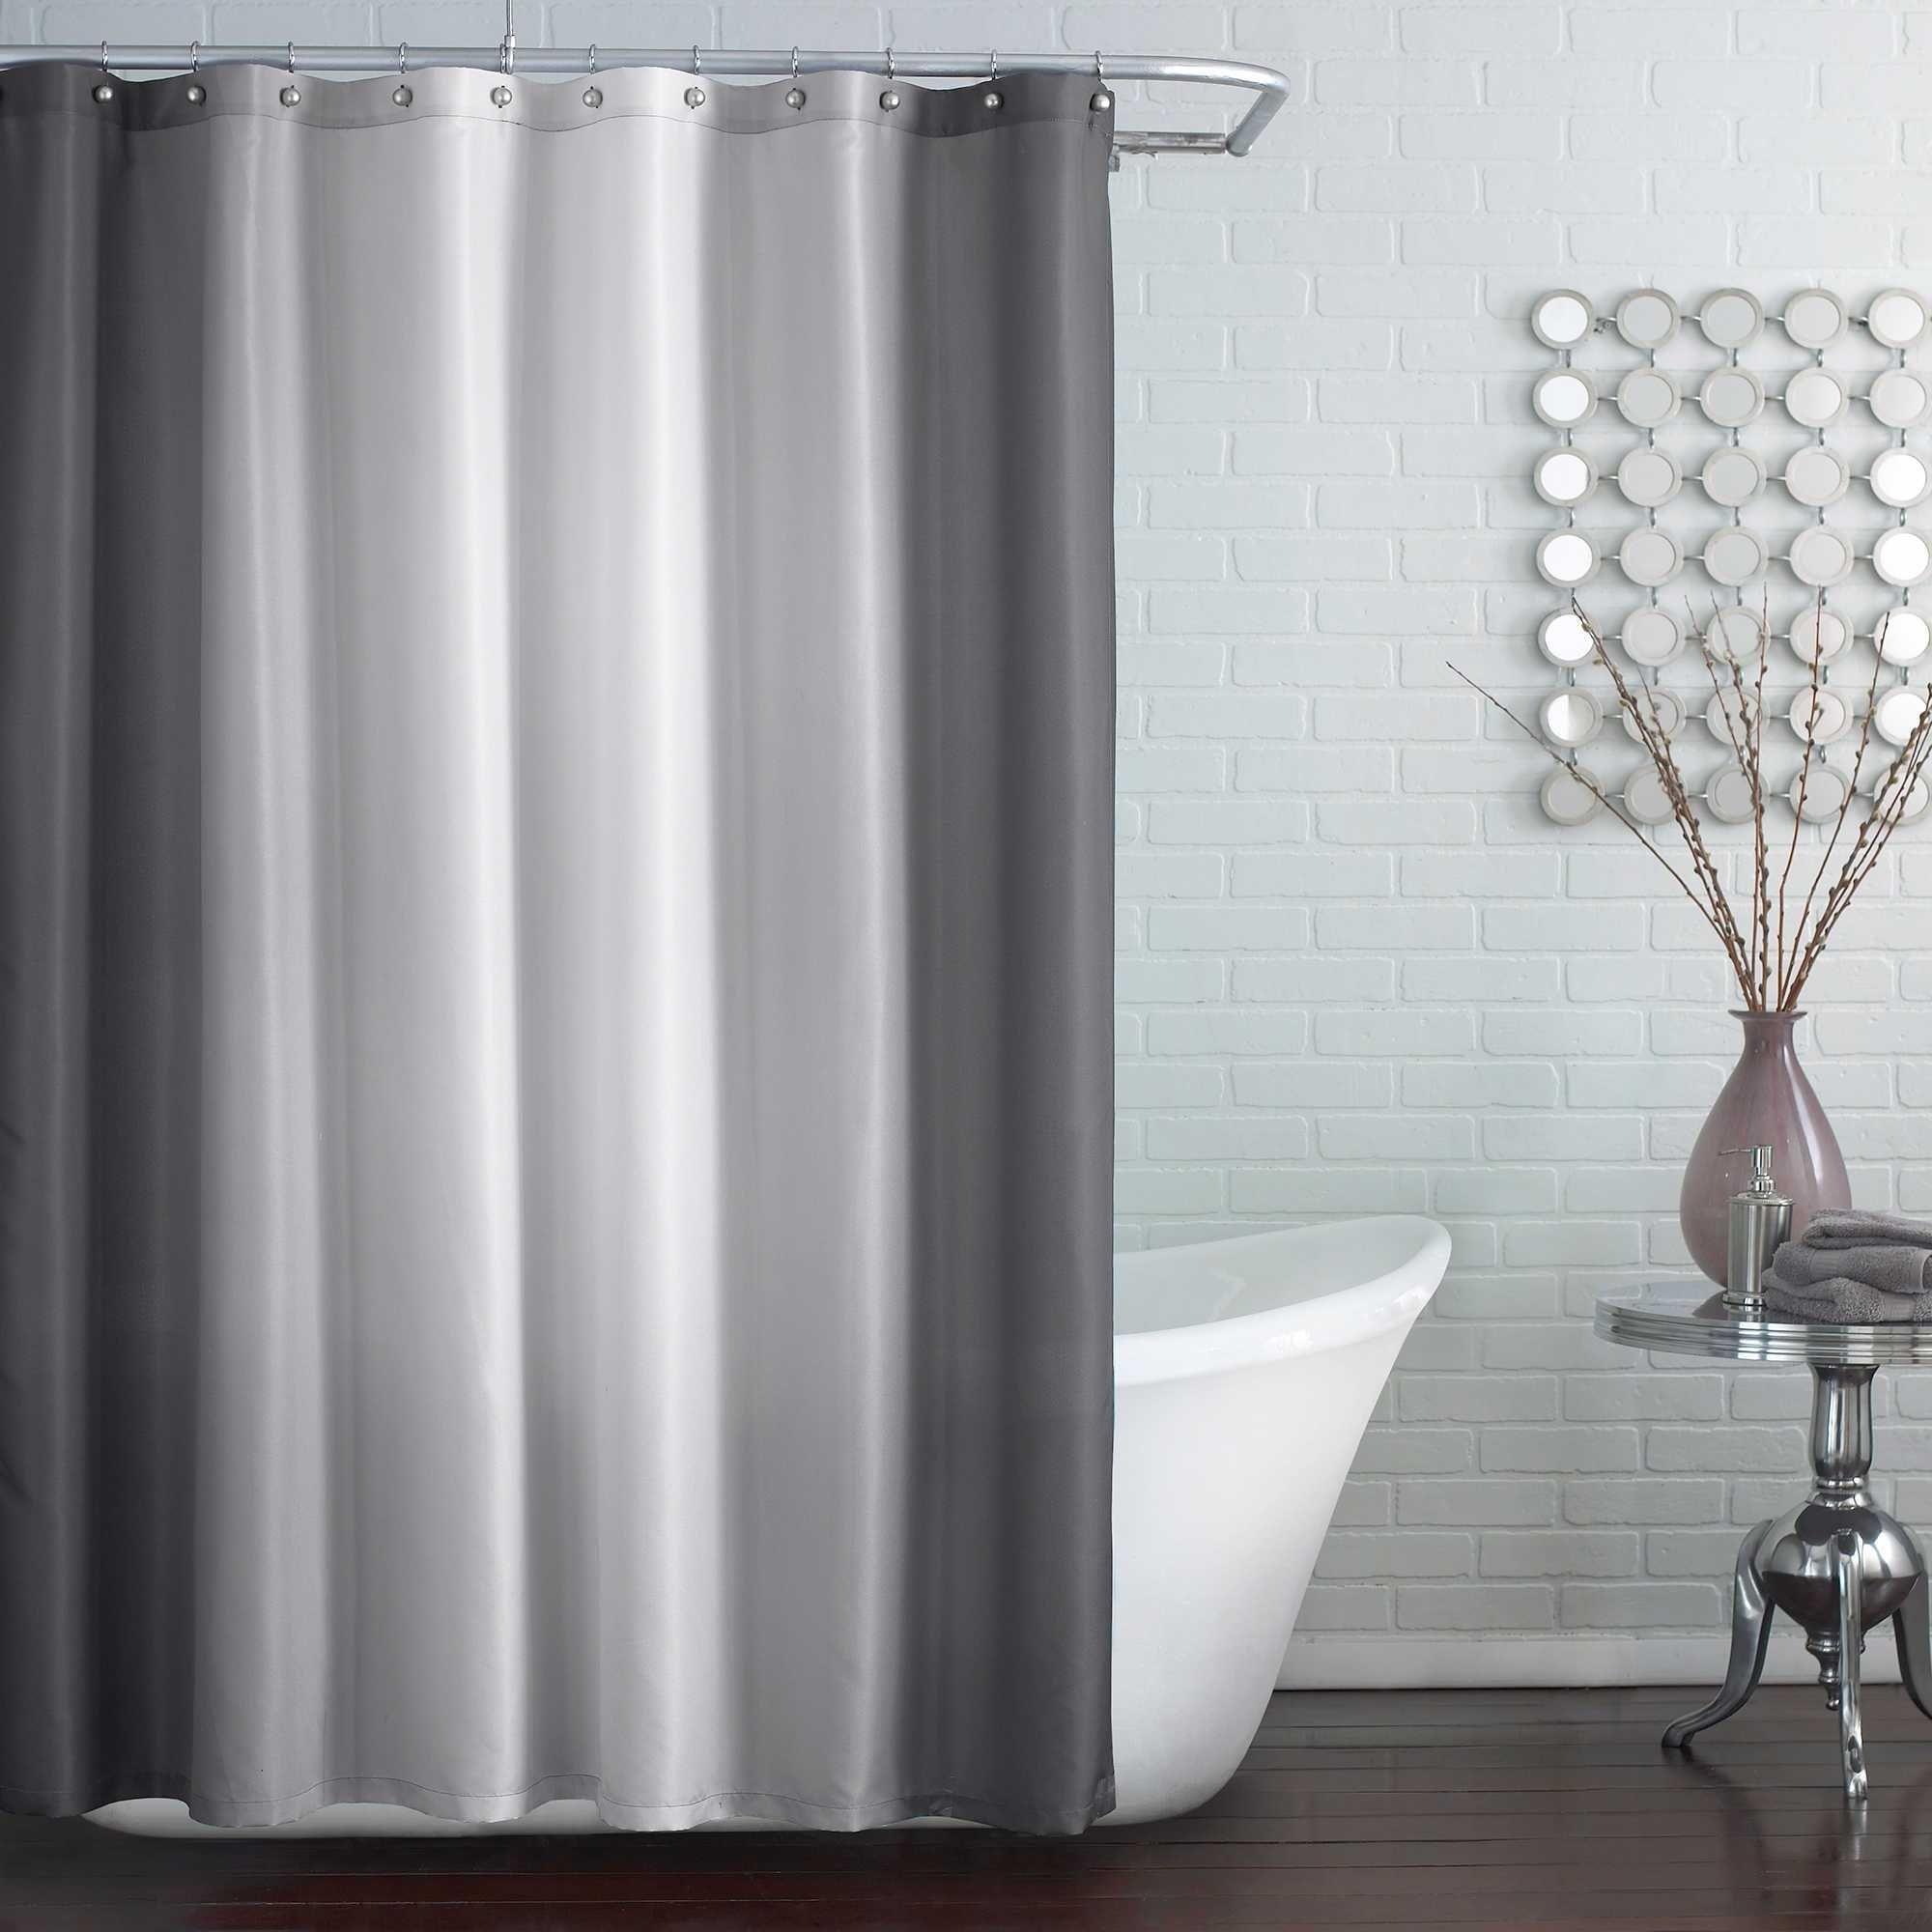 Shower Curtain Length Long